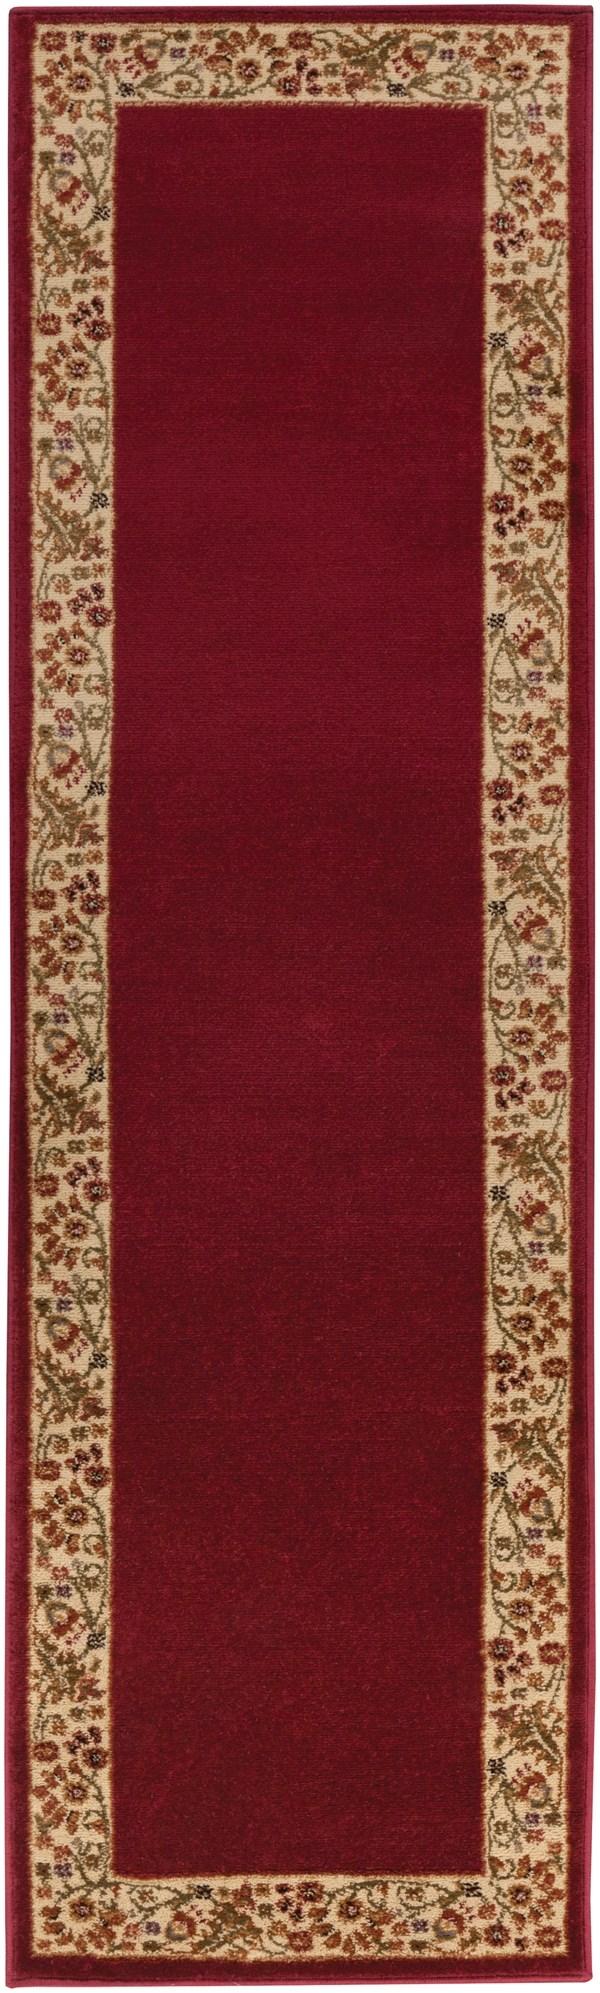 Dark Red, Wheat, Camel, Dark Brown Bordered Area Rug